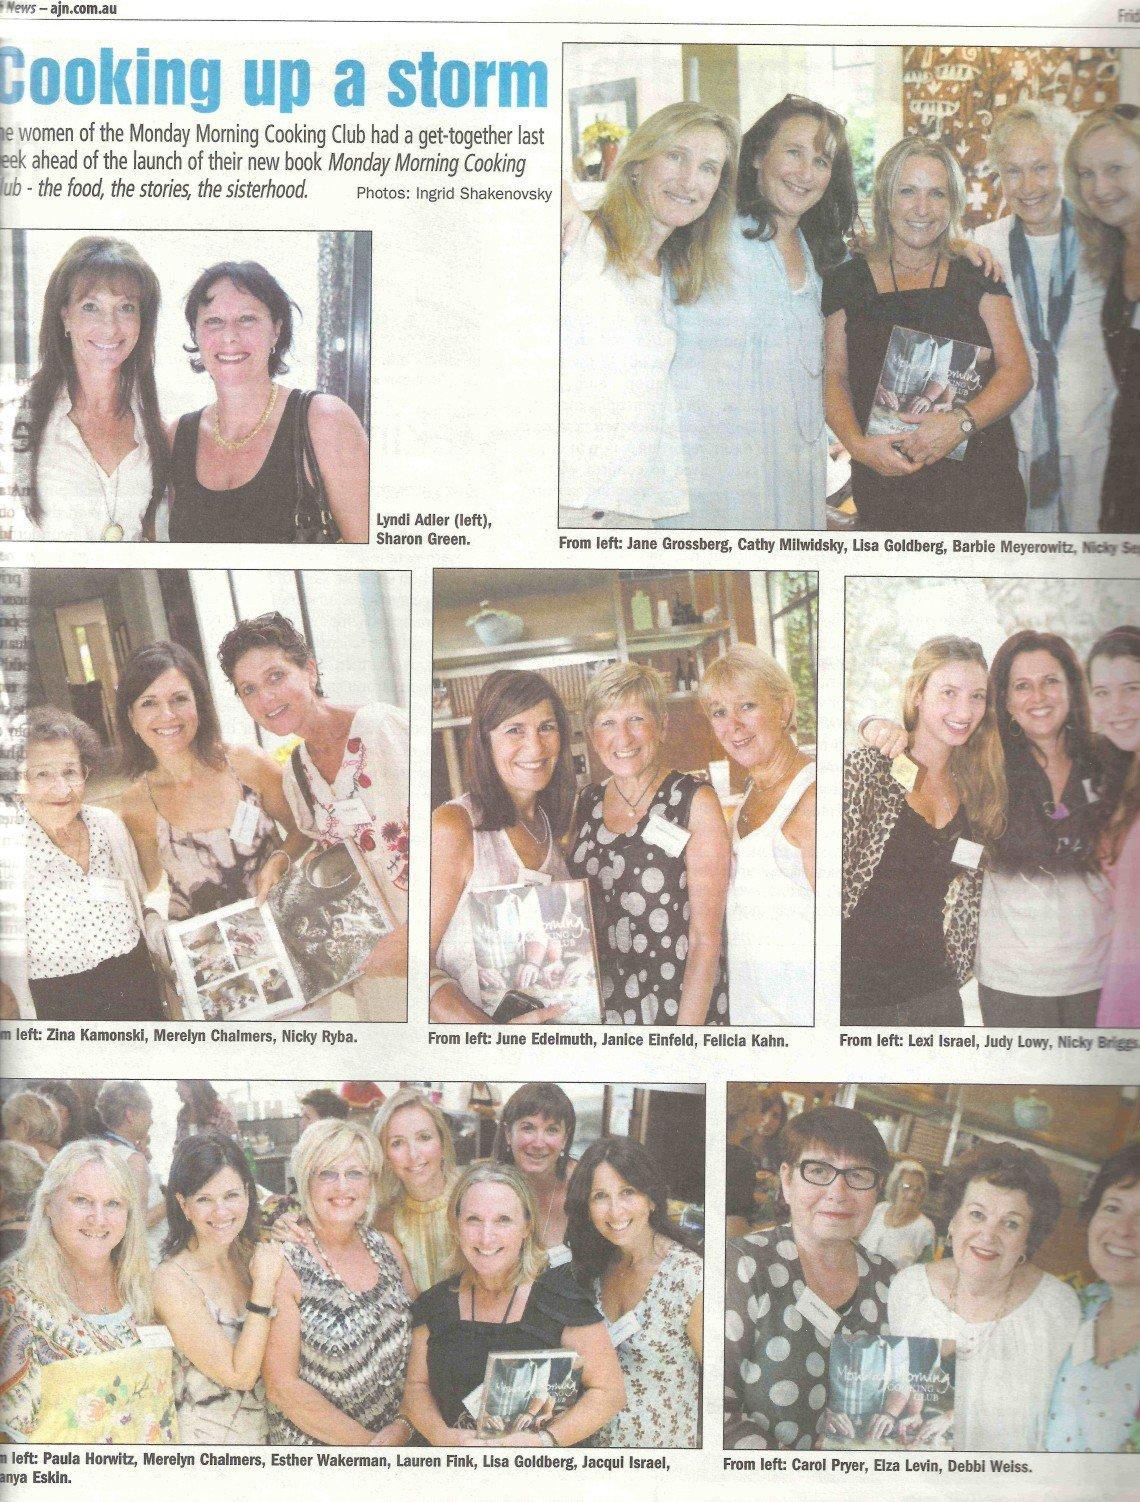 Australian Jewish News 1 April 2011, Book launch copy